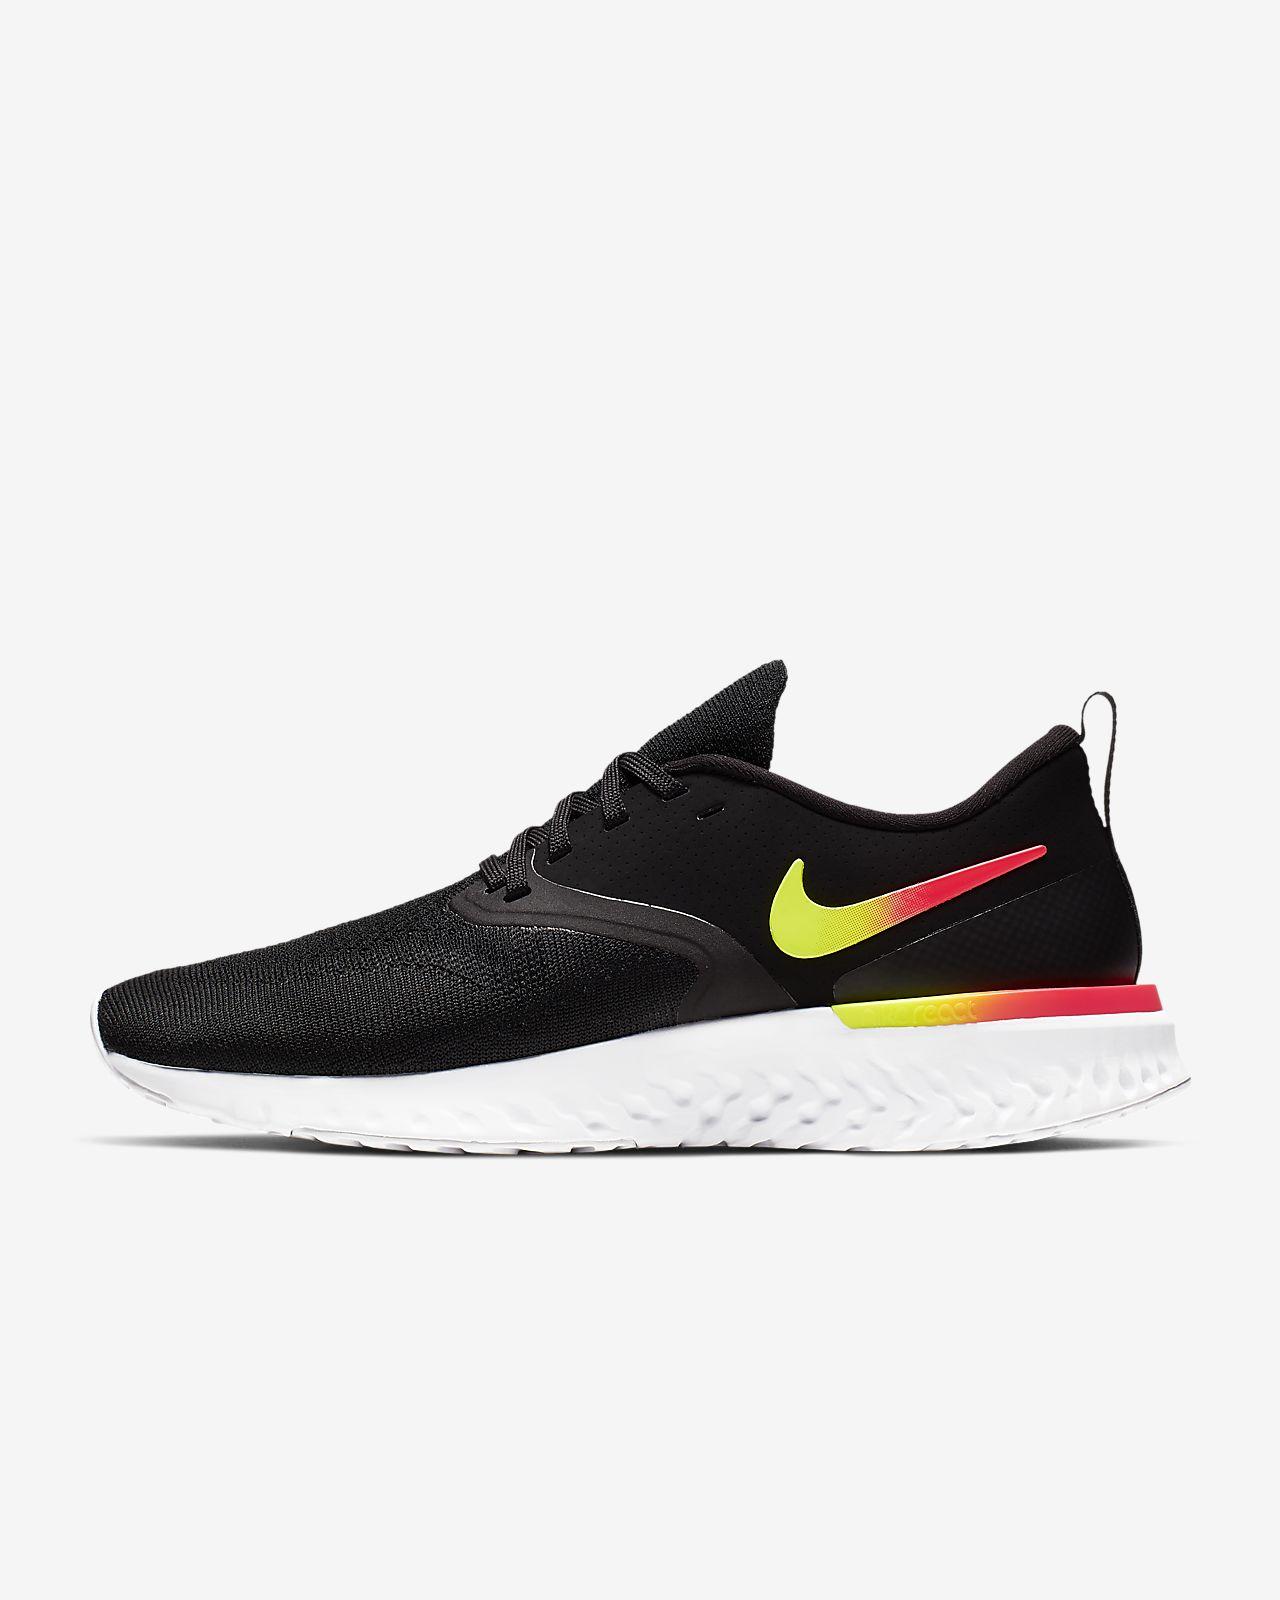 ada1fb62108d91 Nike Odyssey React Flyknit 2 Damen-Laufschuh. Nike.com DE